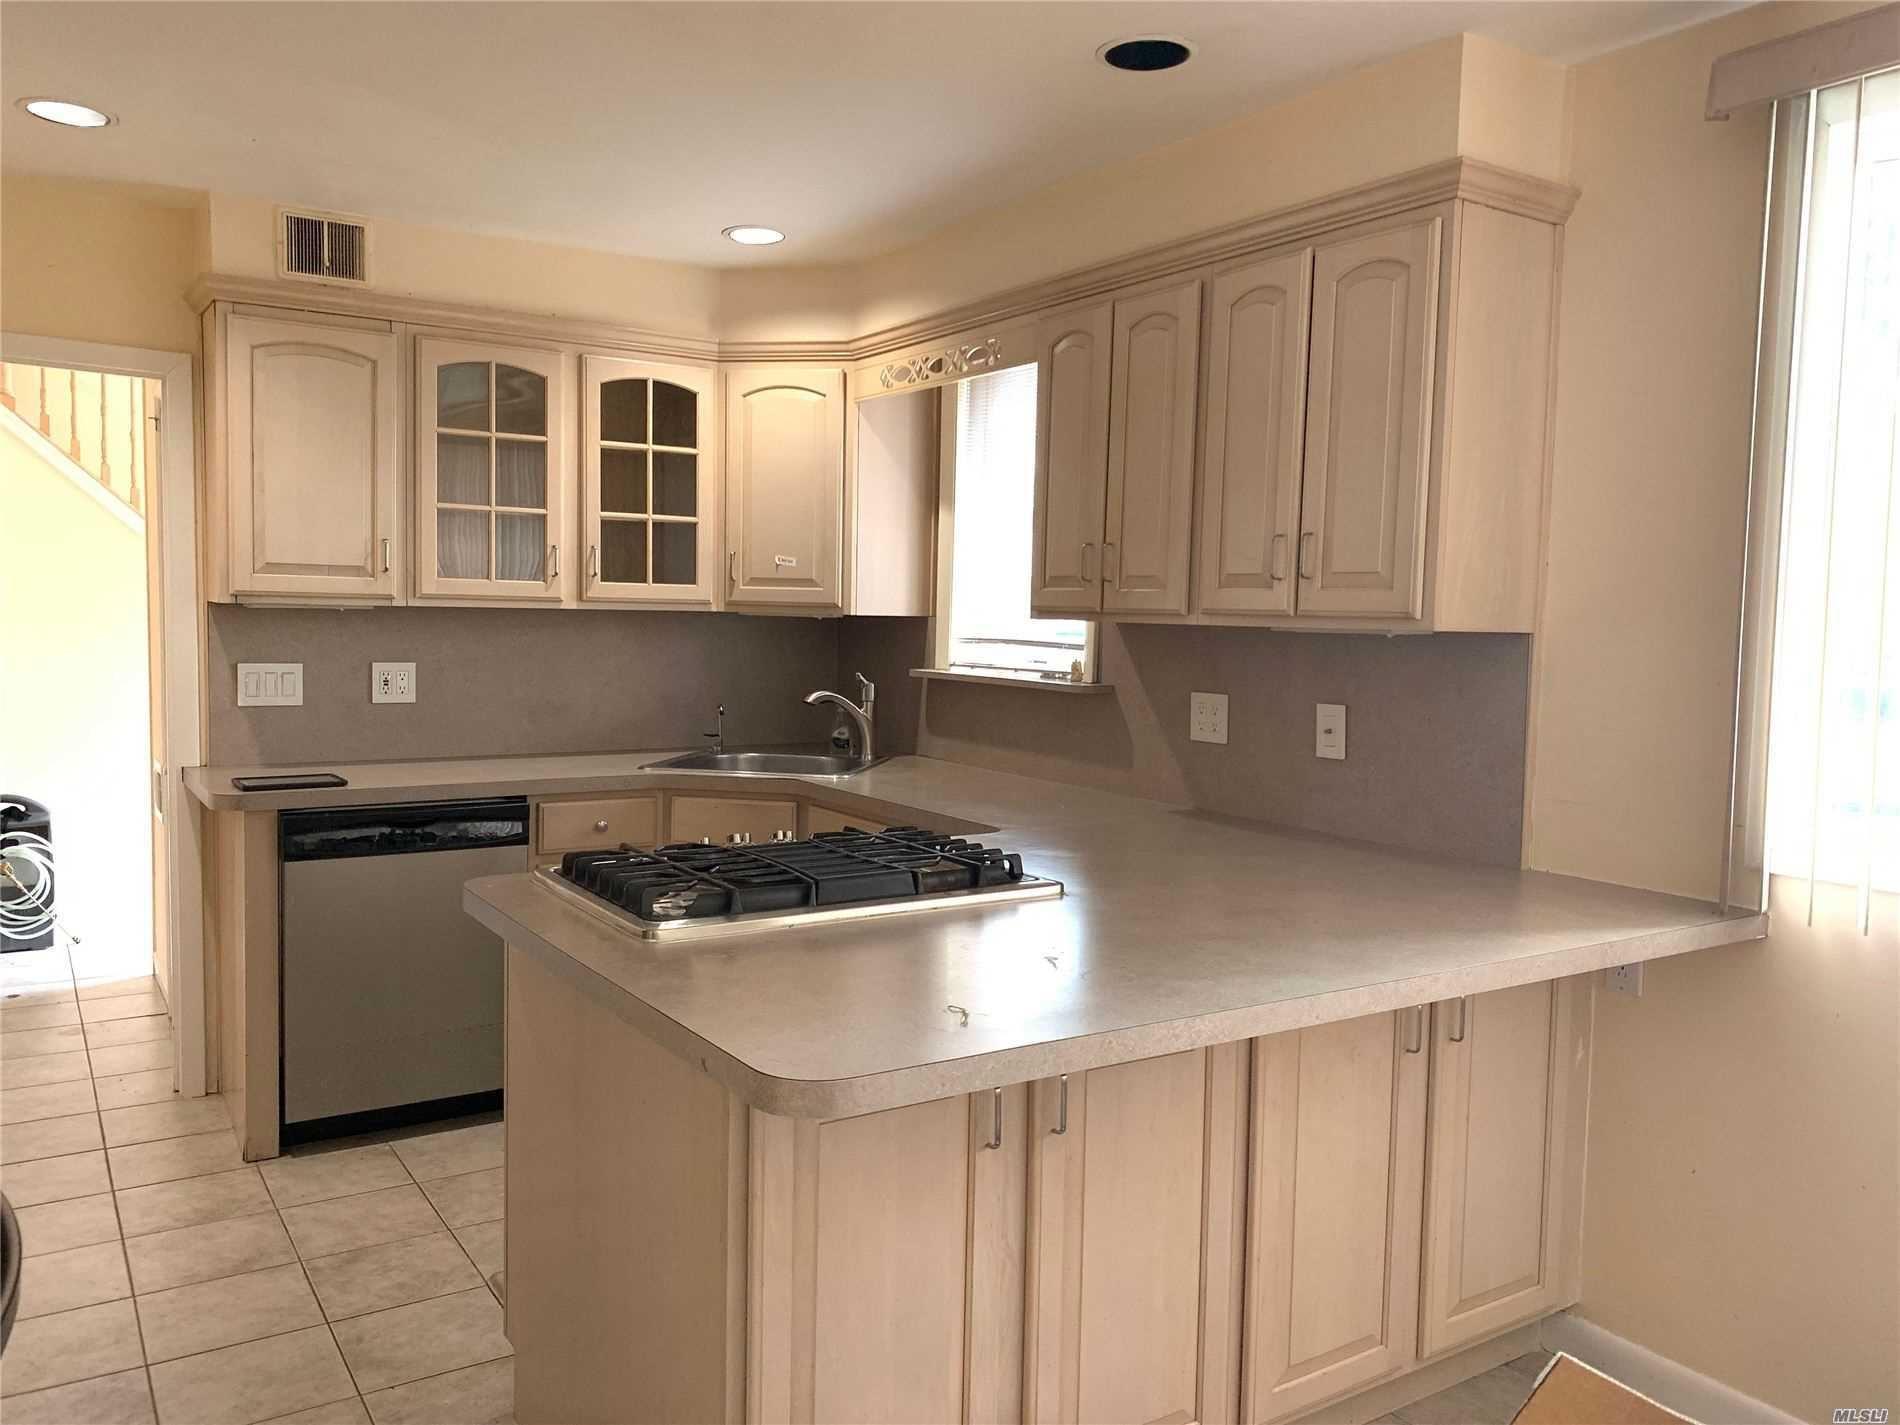 59 Hillturn Lane, Roslyn Heights, NY 11577 - MLS#: 3191438